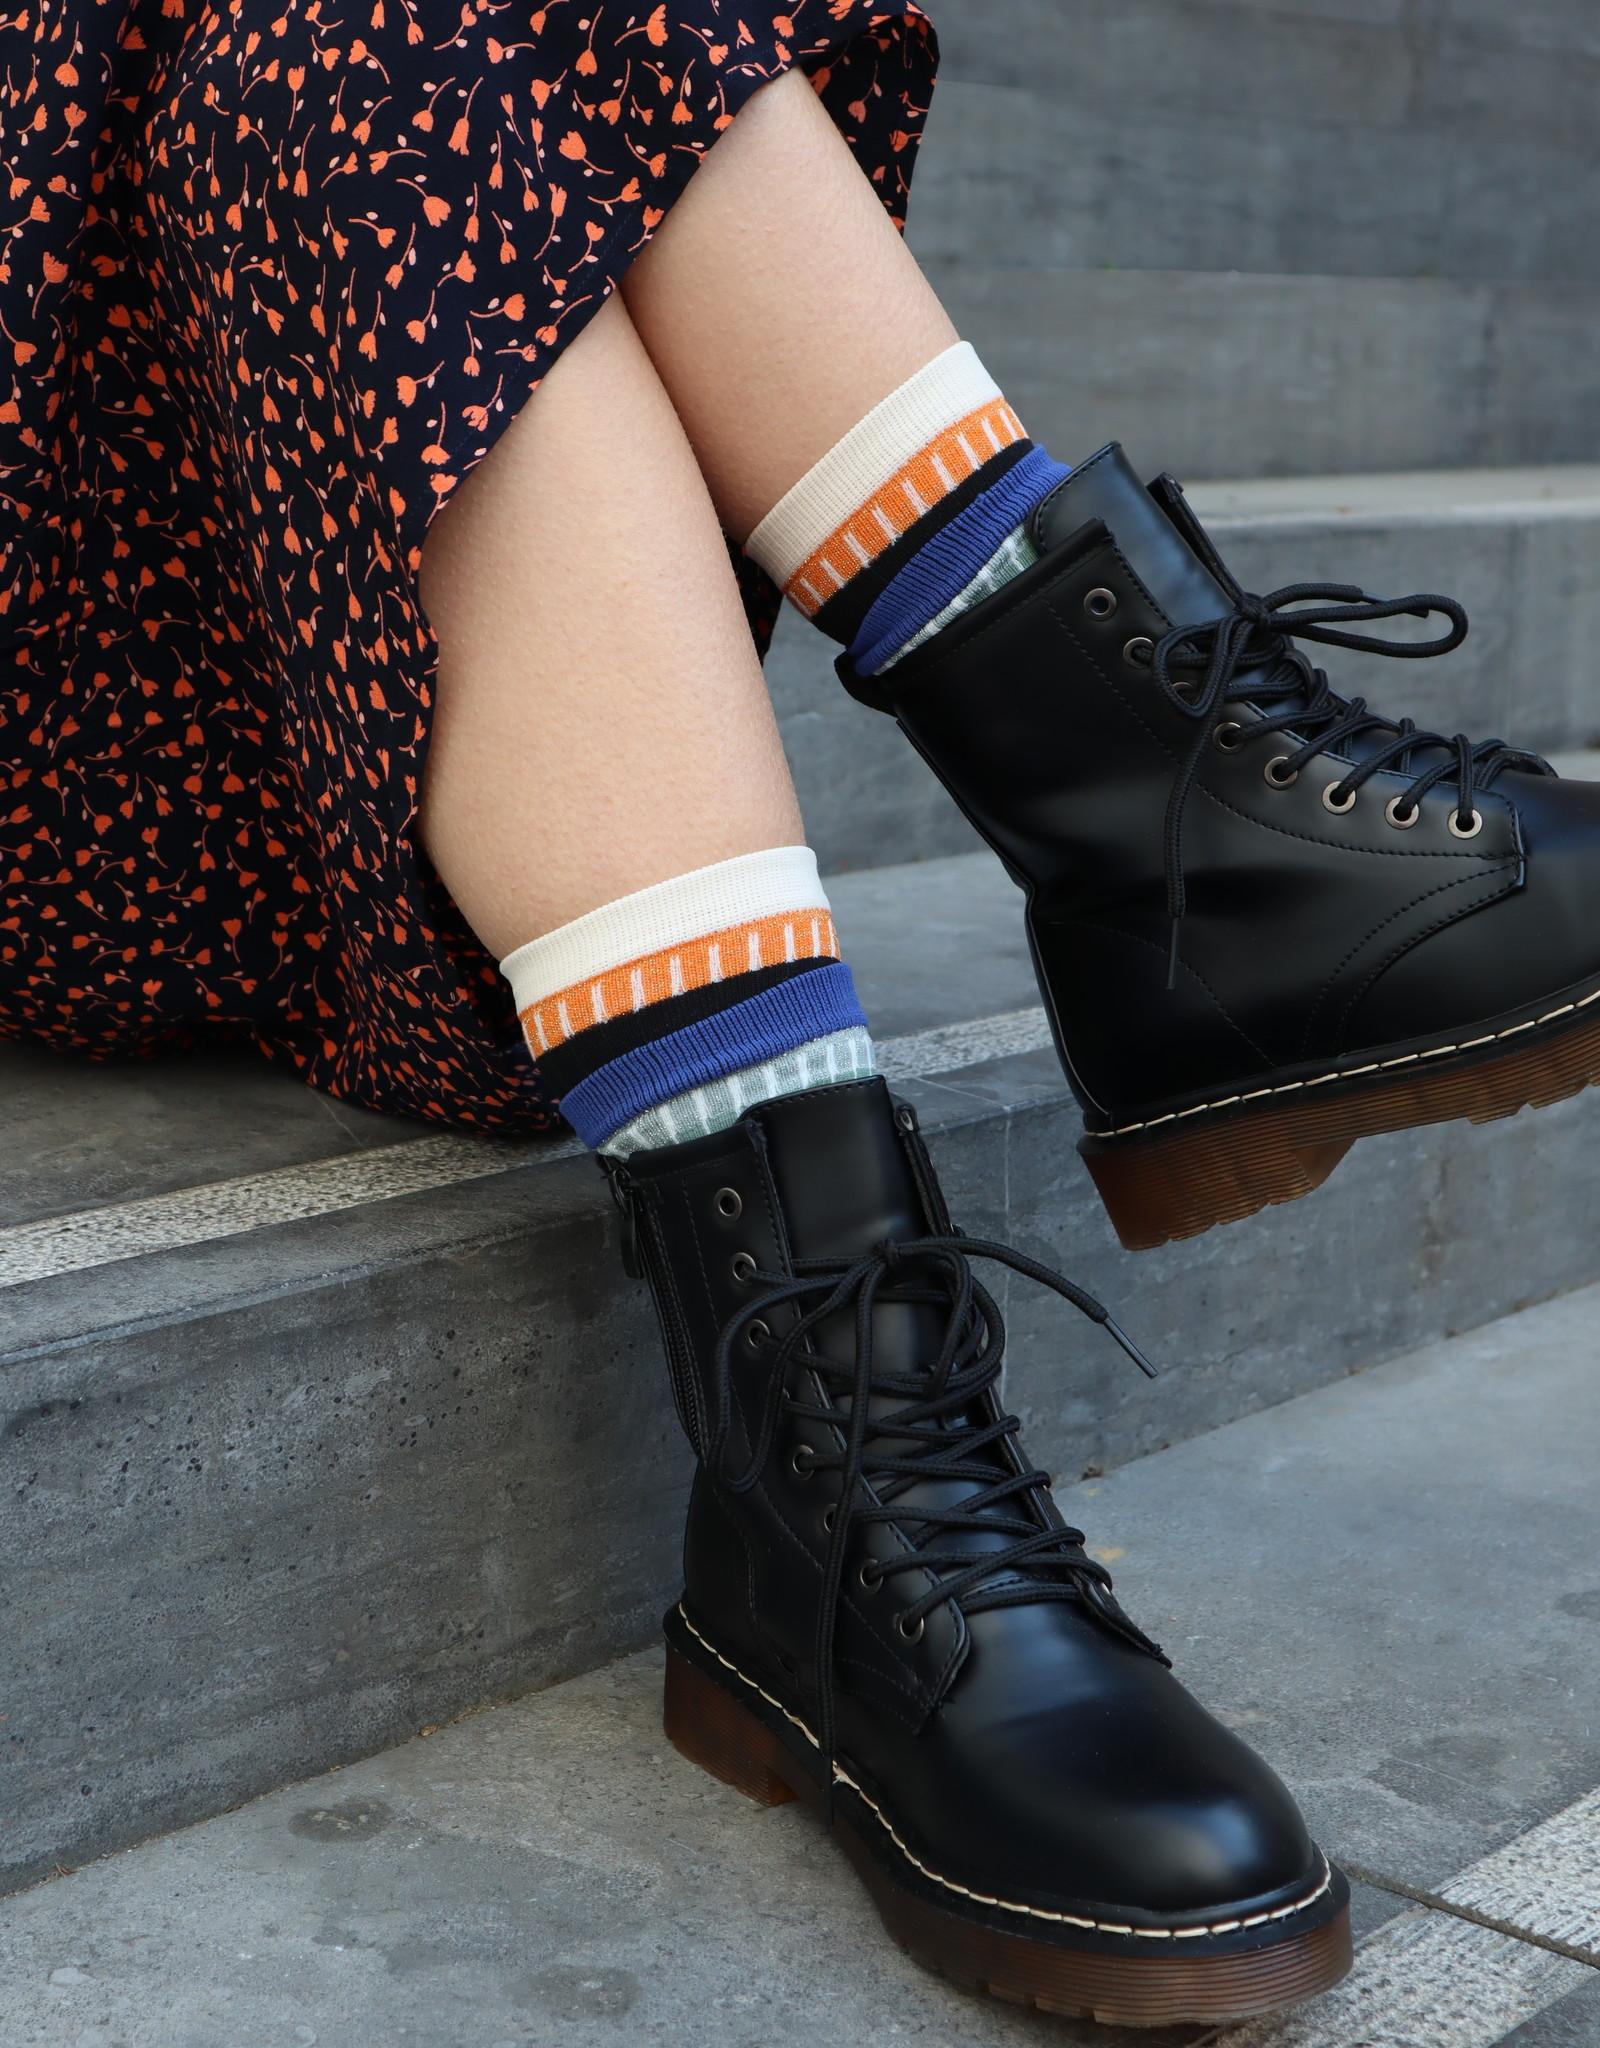 Make My Day Make My Day Combat boots Black